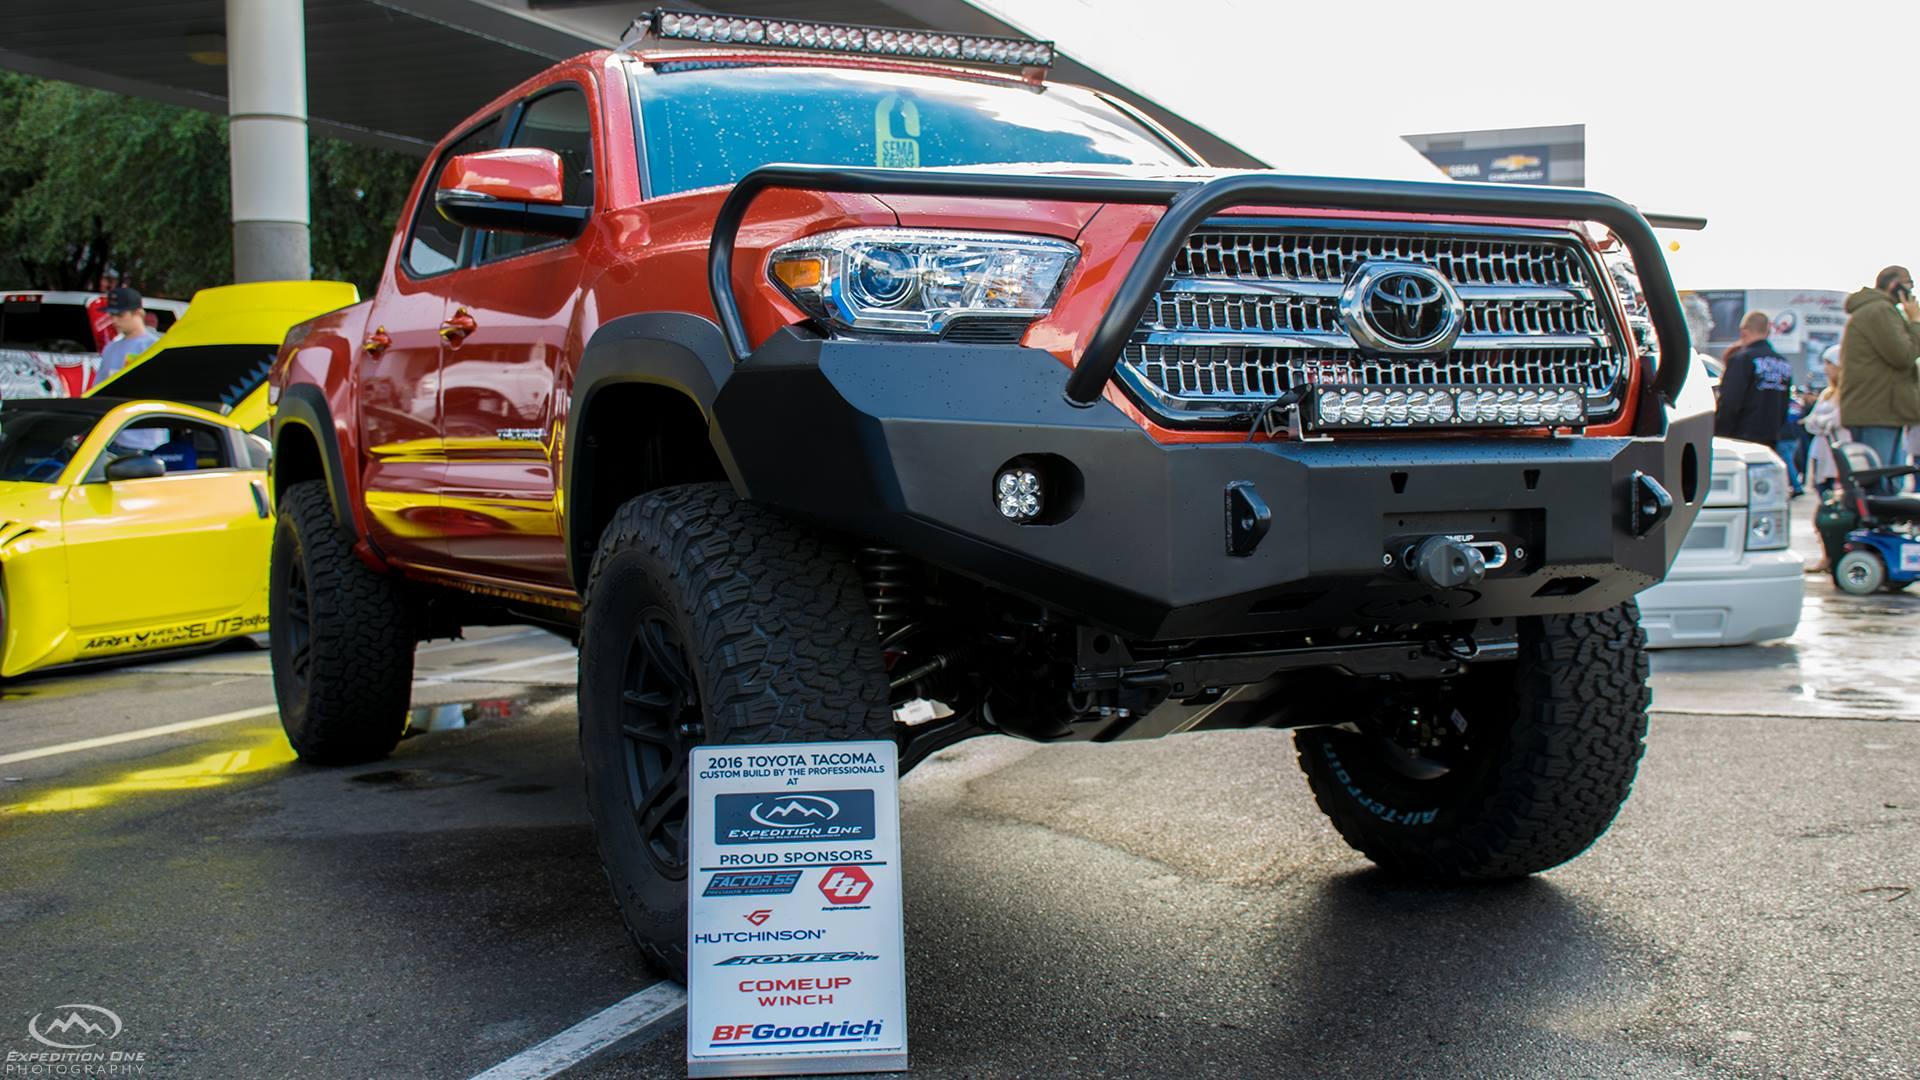 2017 Toyota Tacoma TRD Pro Review - Page 5 - Toyota FJ ...